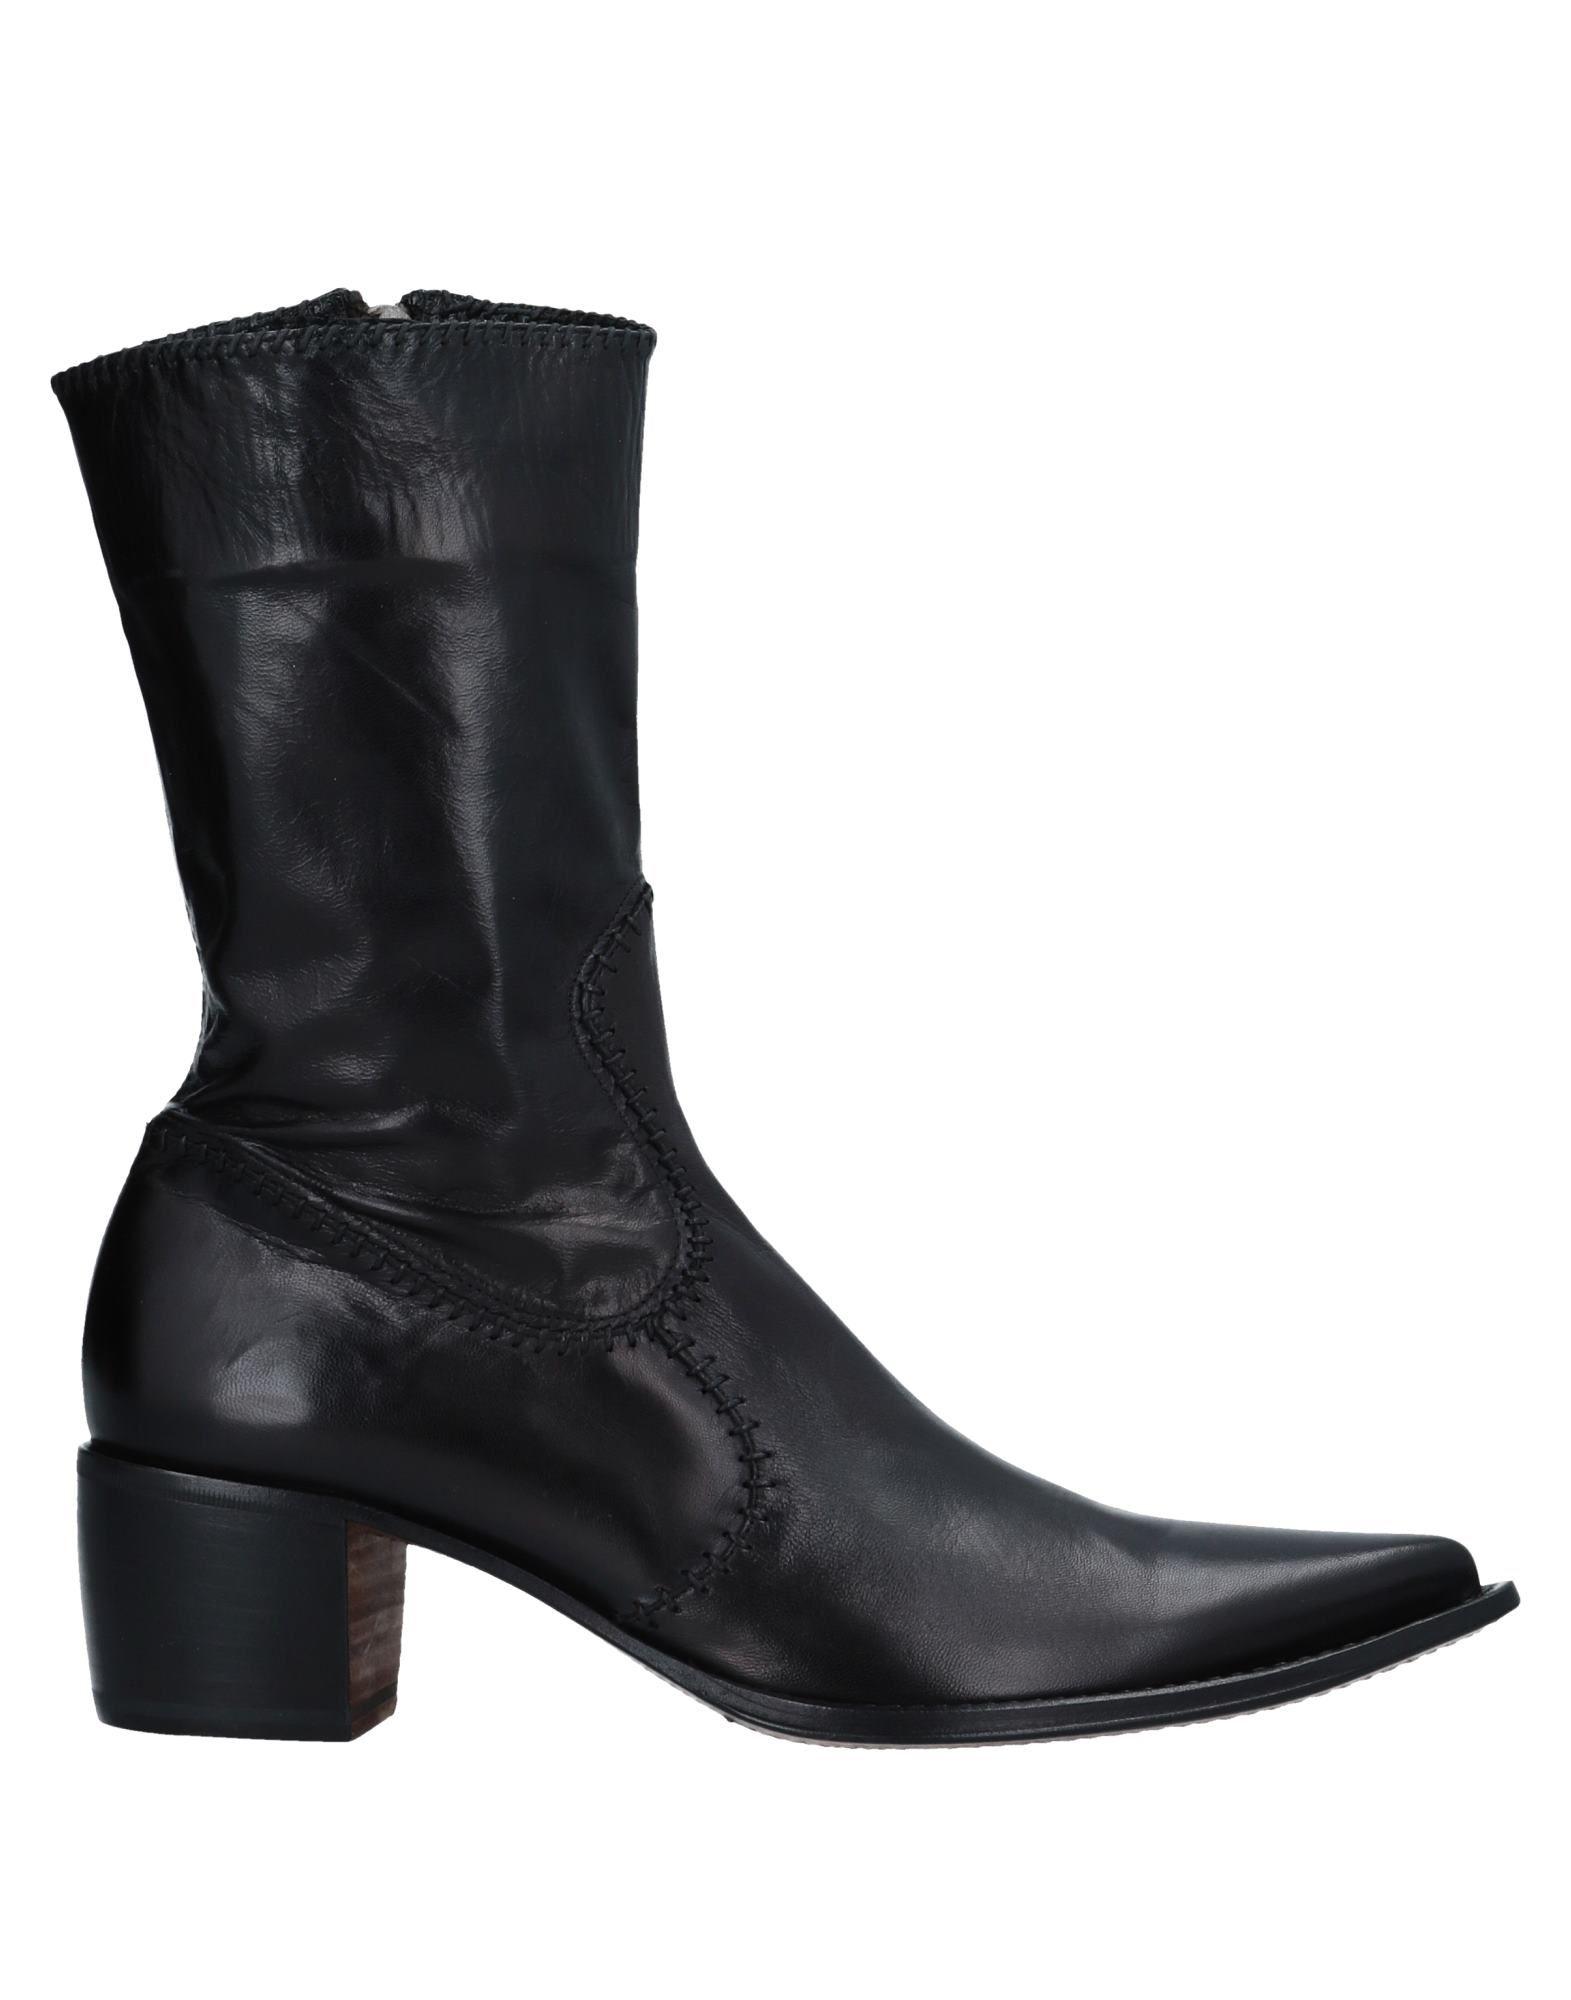 Rabatt Schuhe Rocco P. Stiefelette Damen  11052273QG